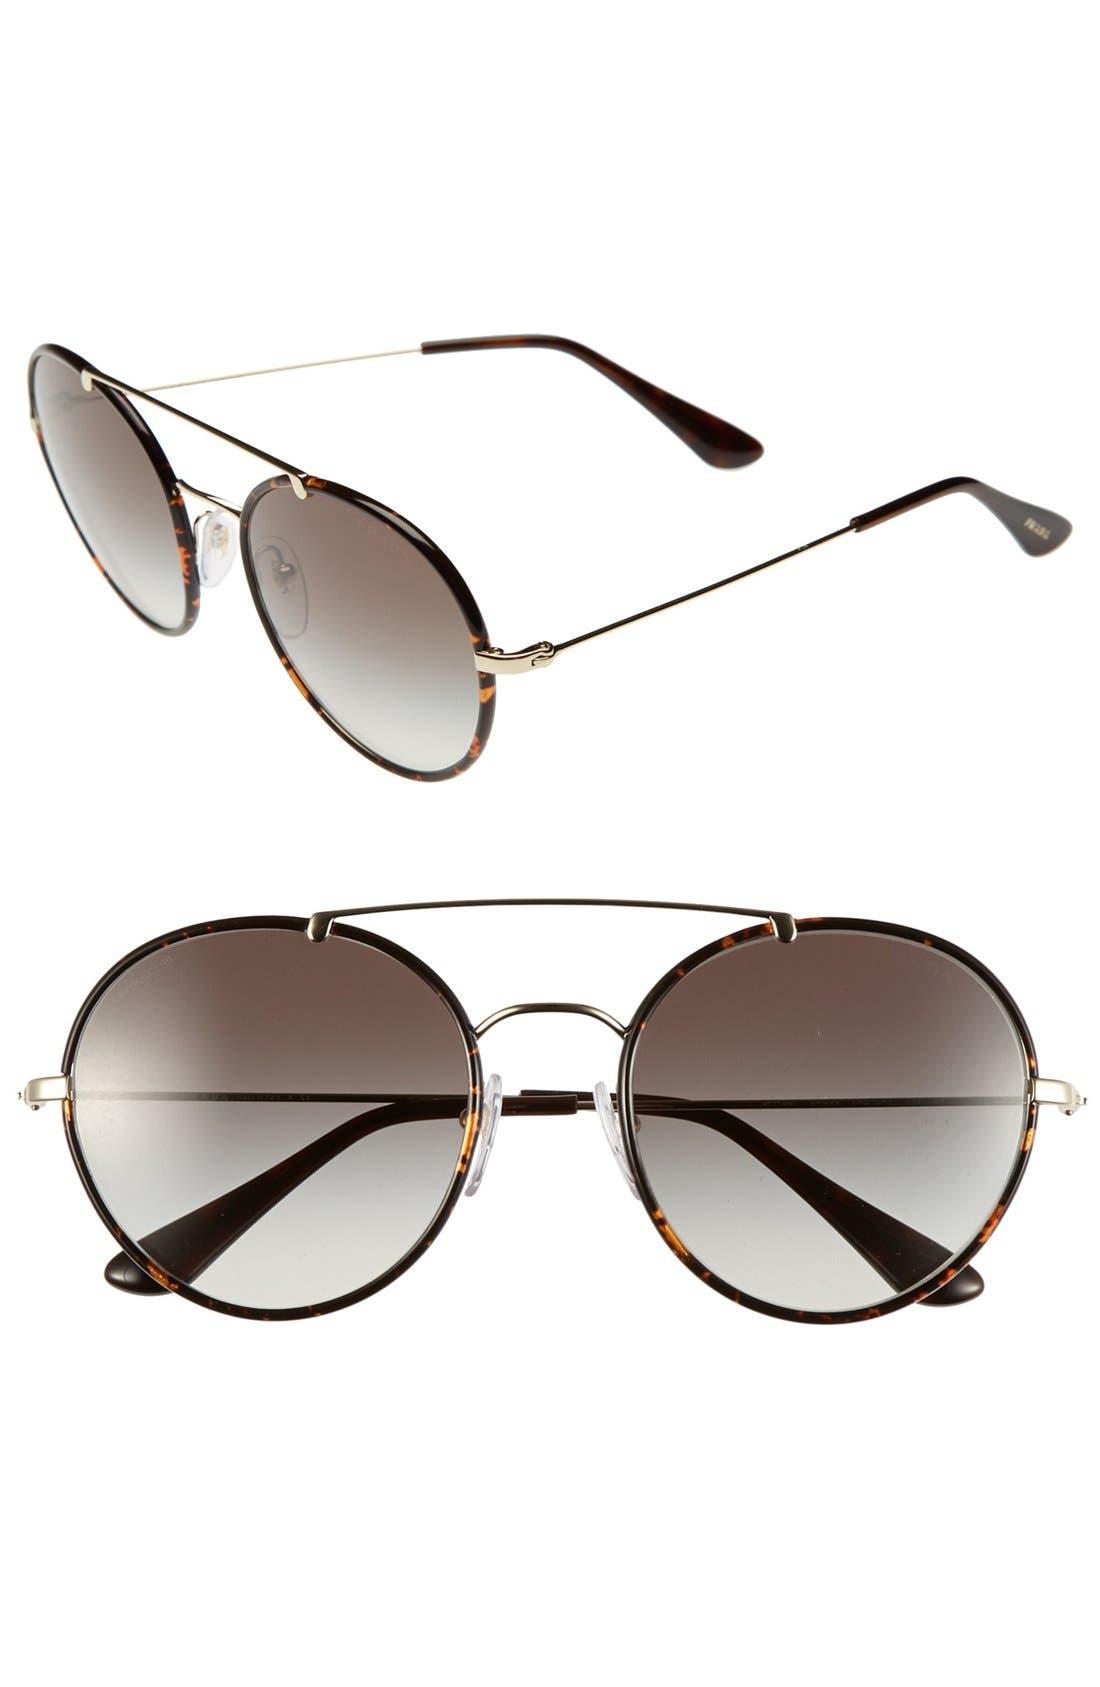 Alternate Image 1 Selected - Prada 54mm Retro Sunglasses